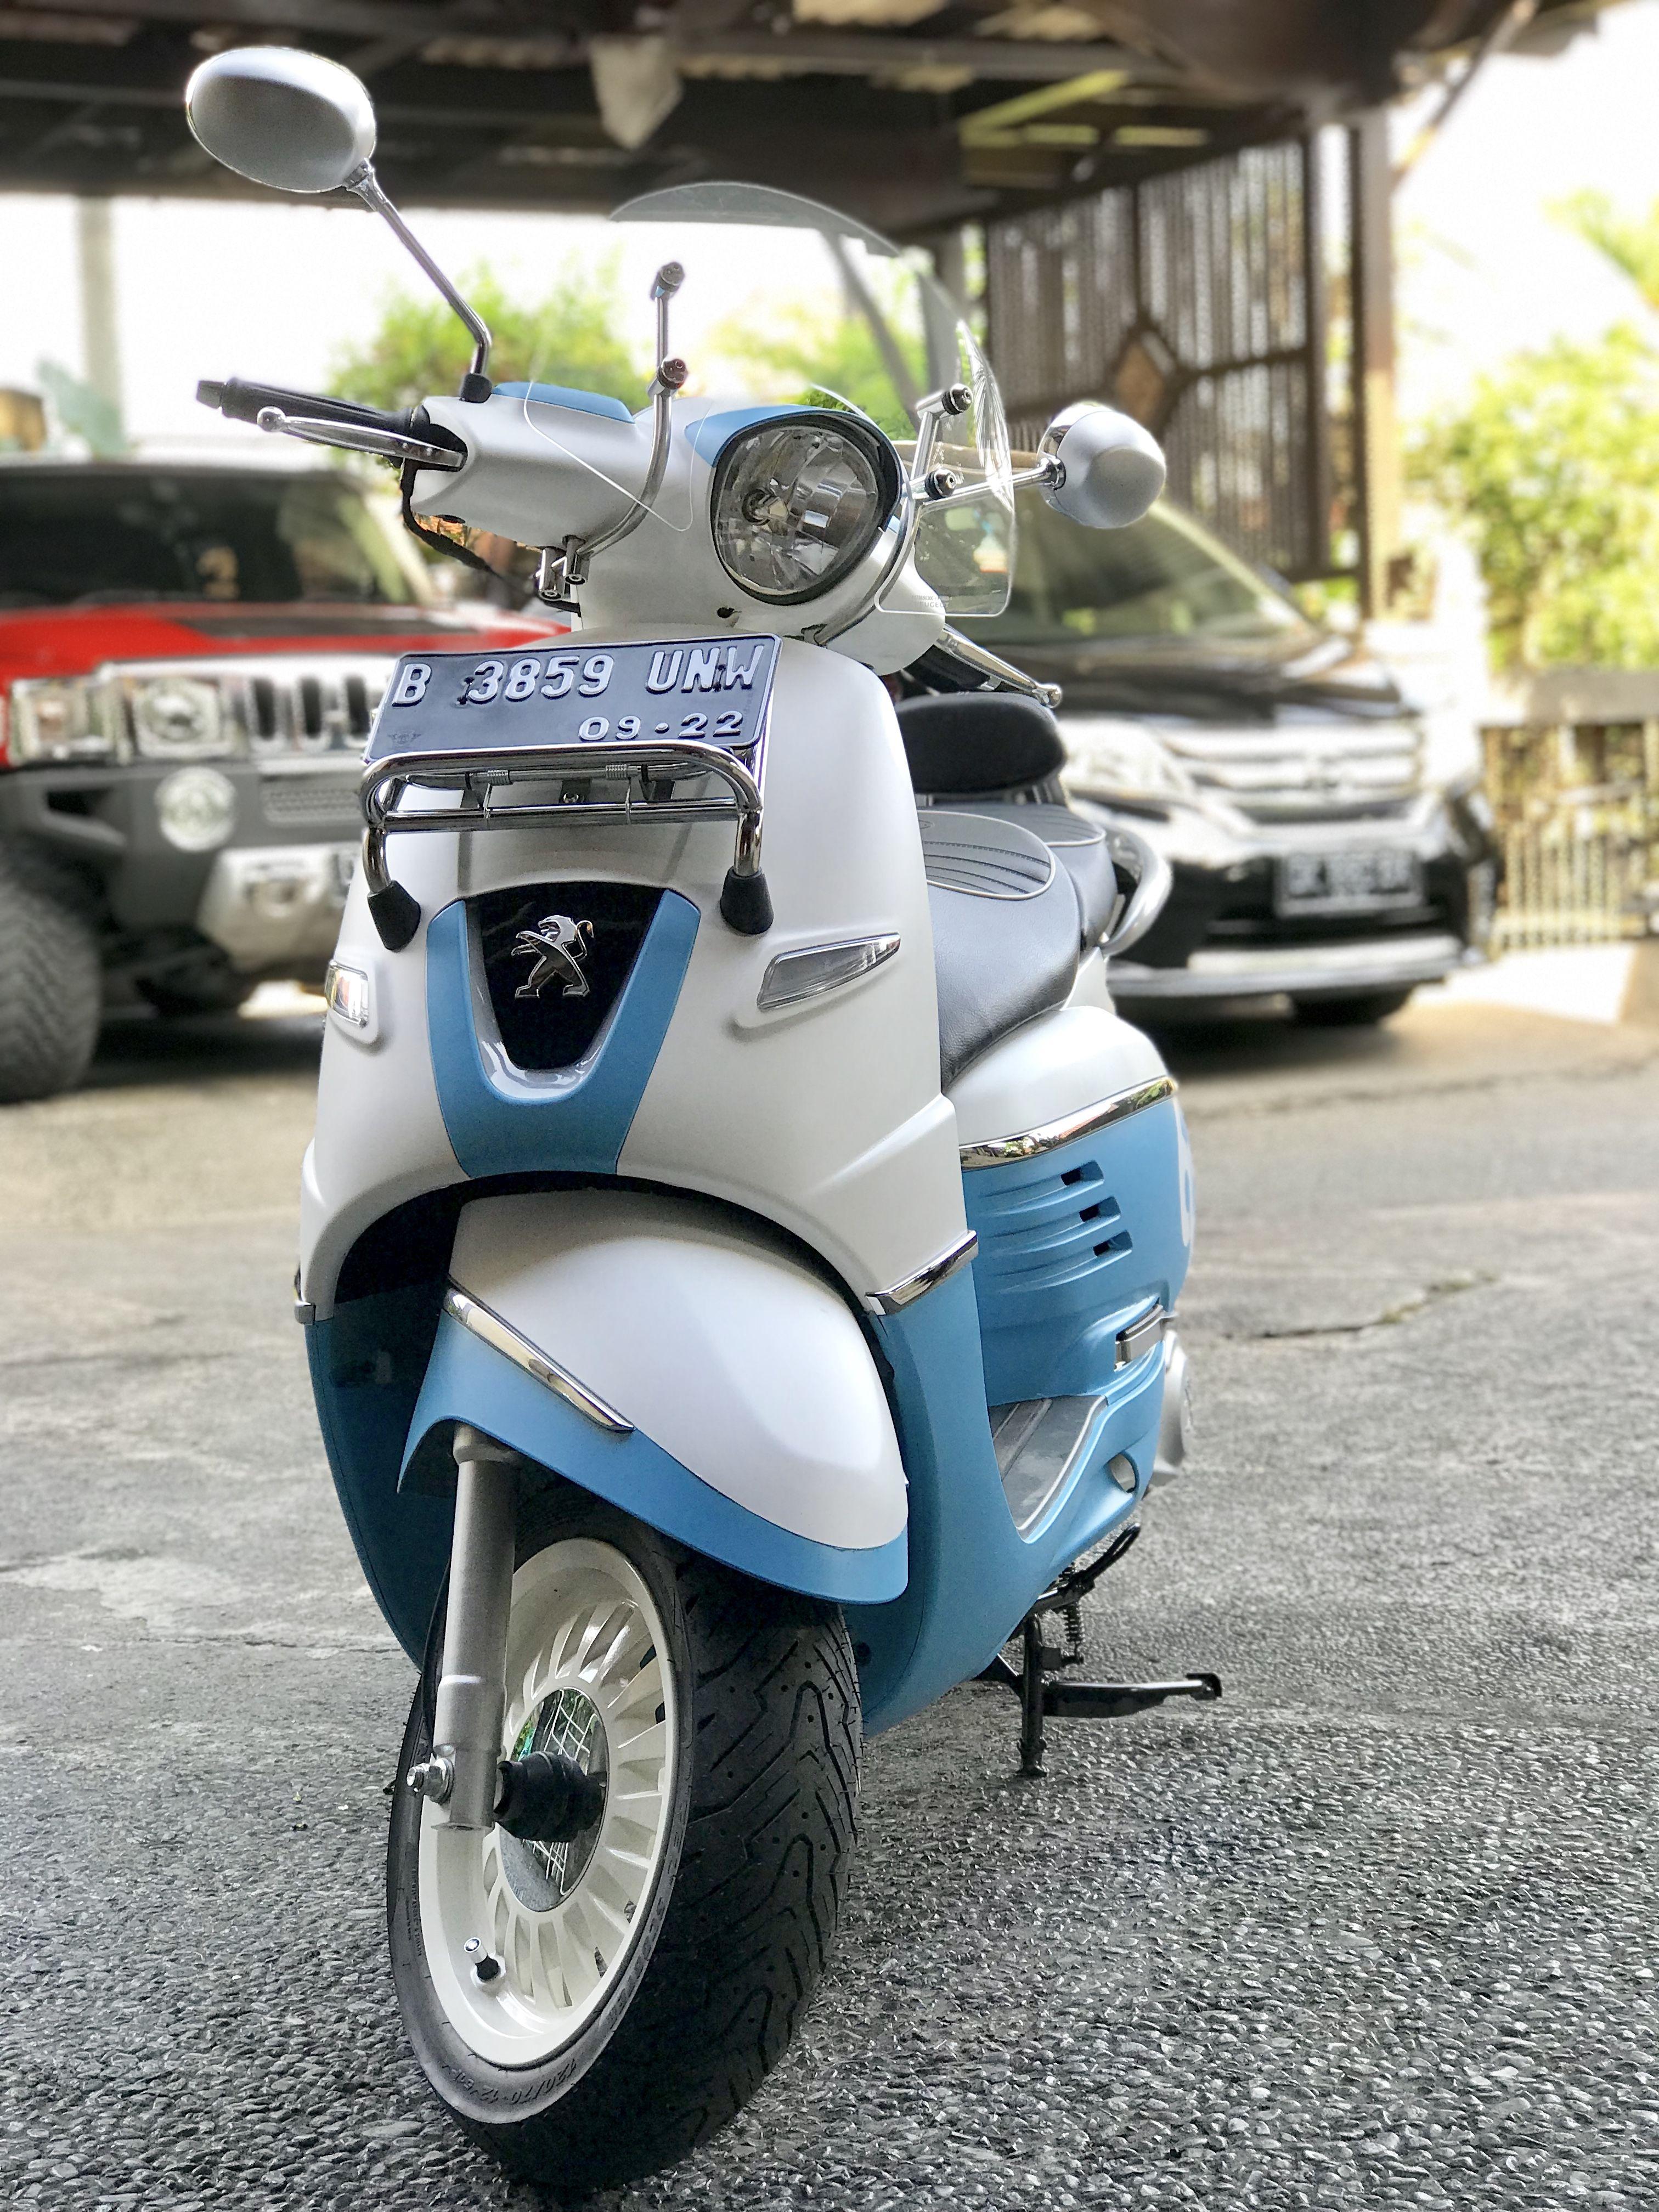 peugeot django evasion 150 - scooter   automotives   peugeot